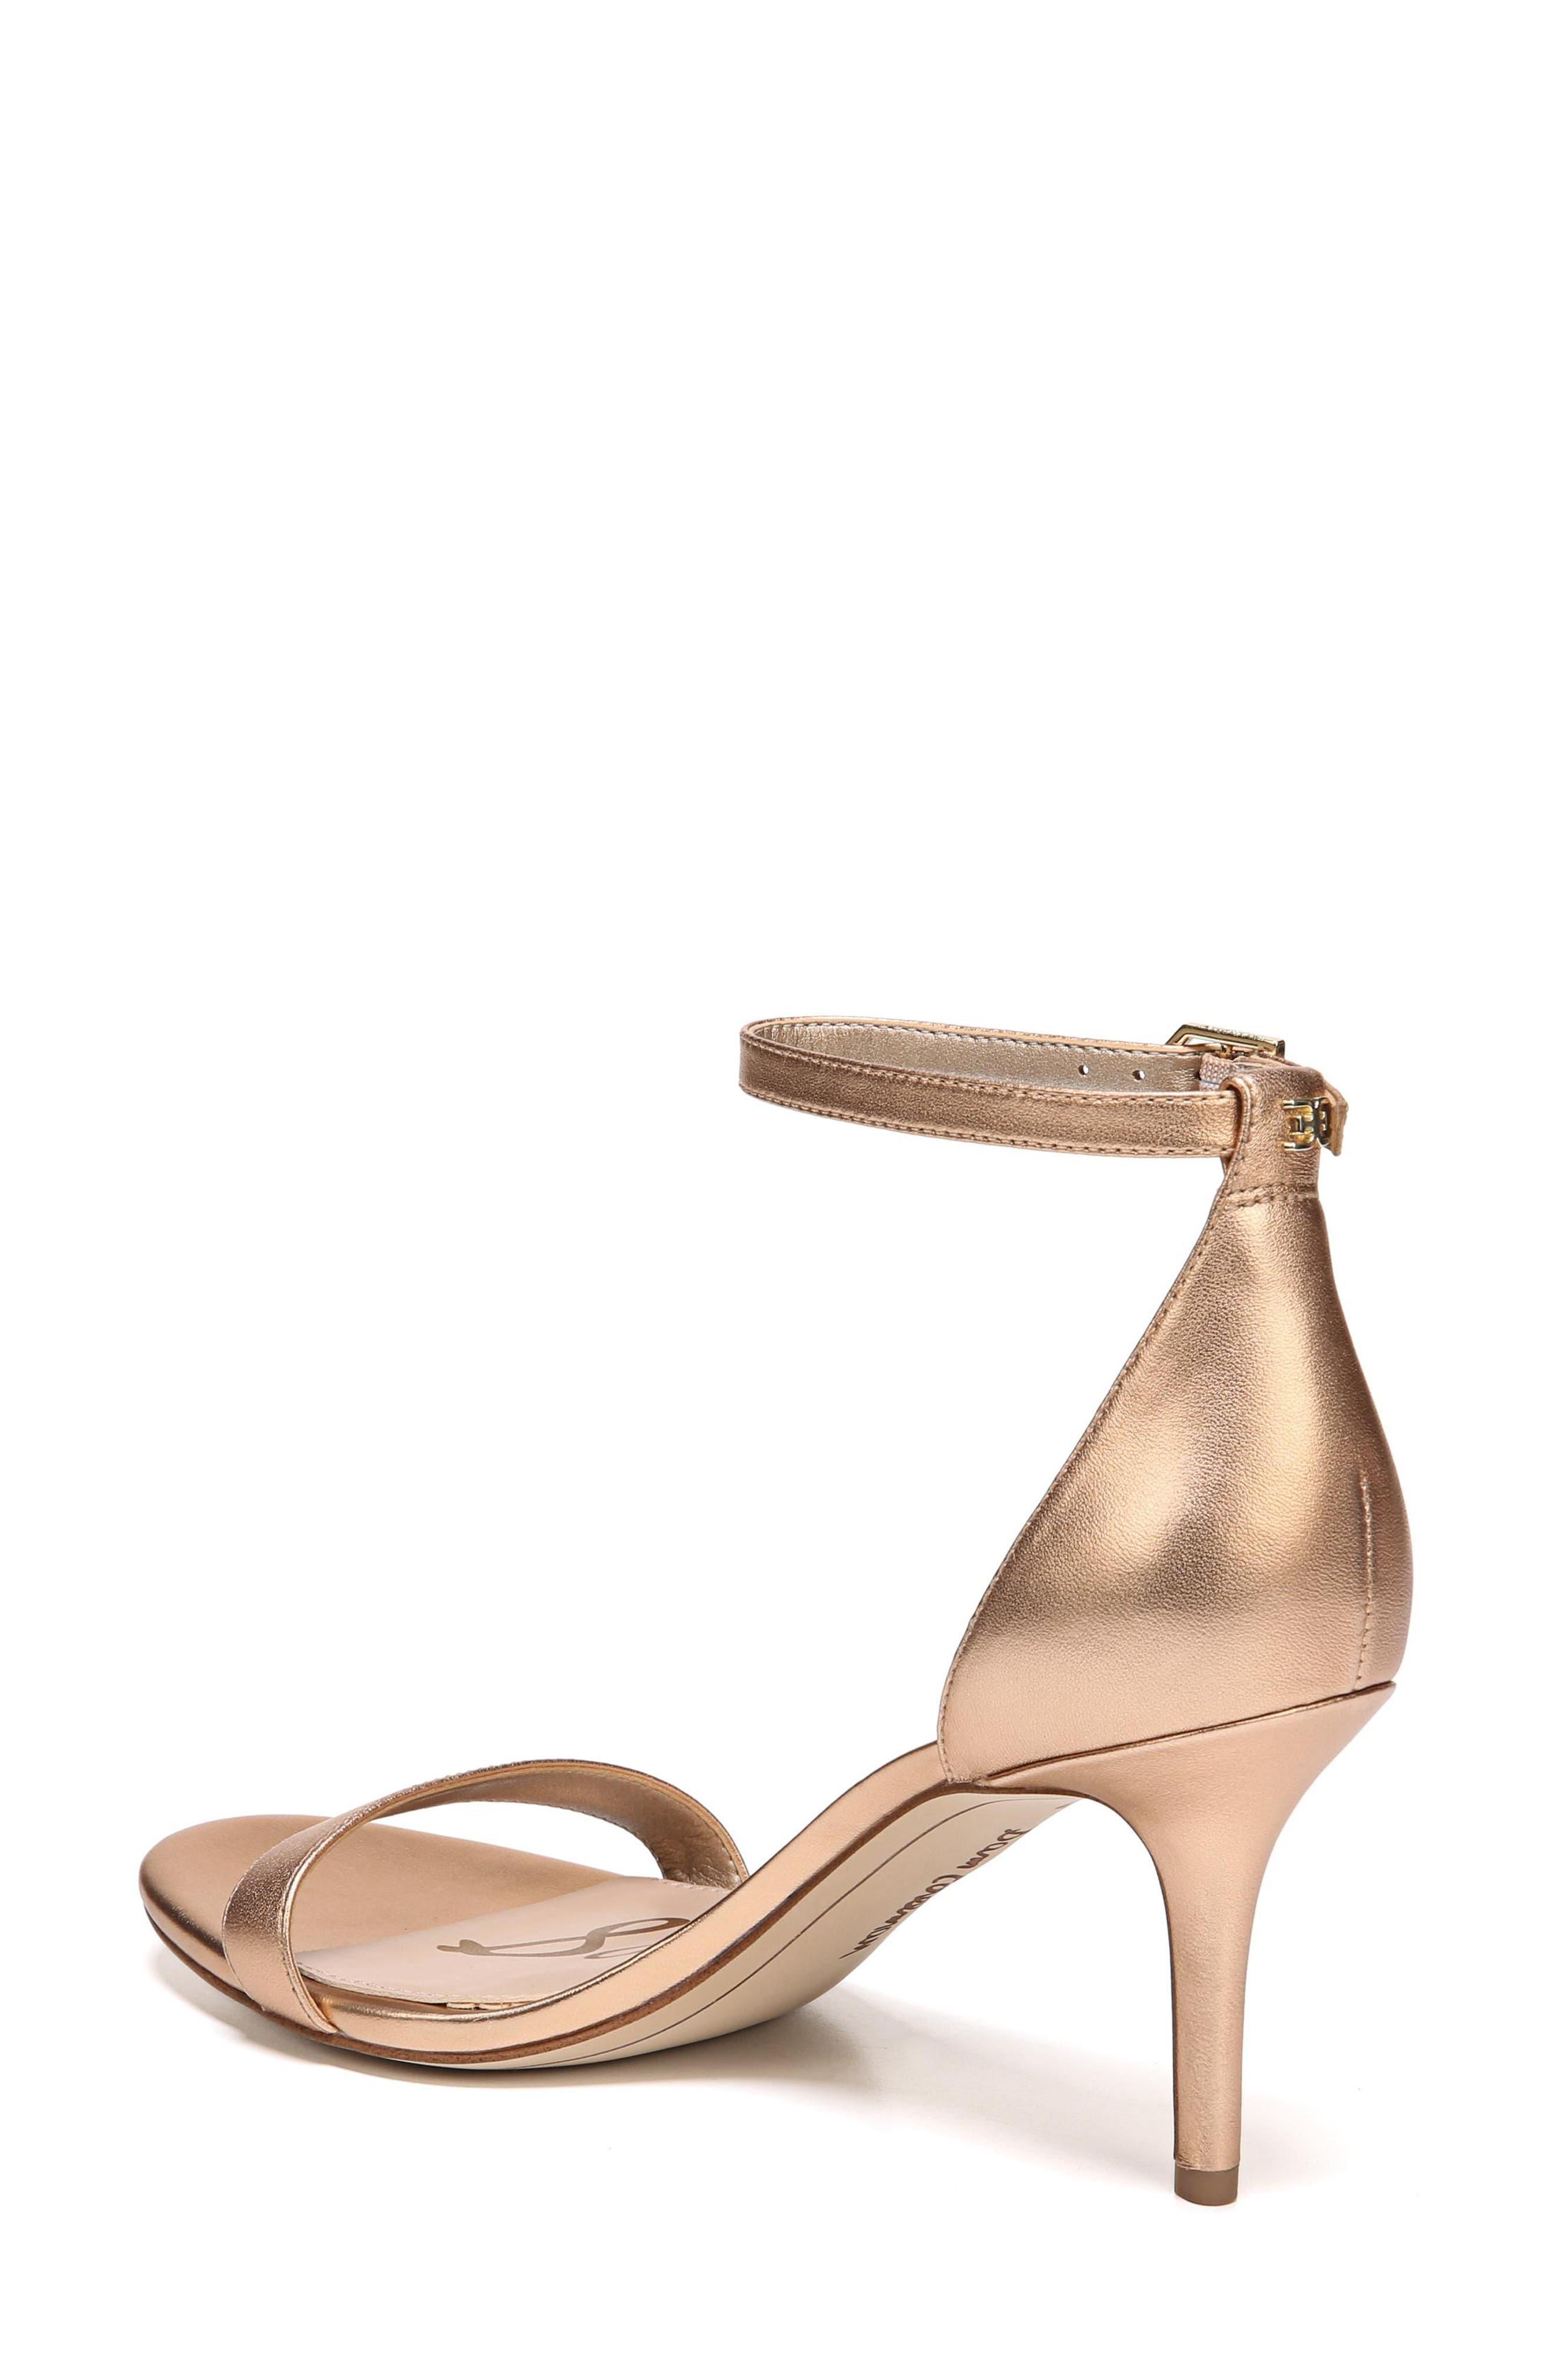 ,                             'Patti' Ankle Strap Sandal,                             Alternate thumbnail 72, color,                             221